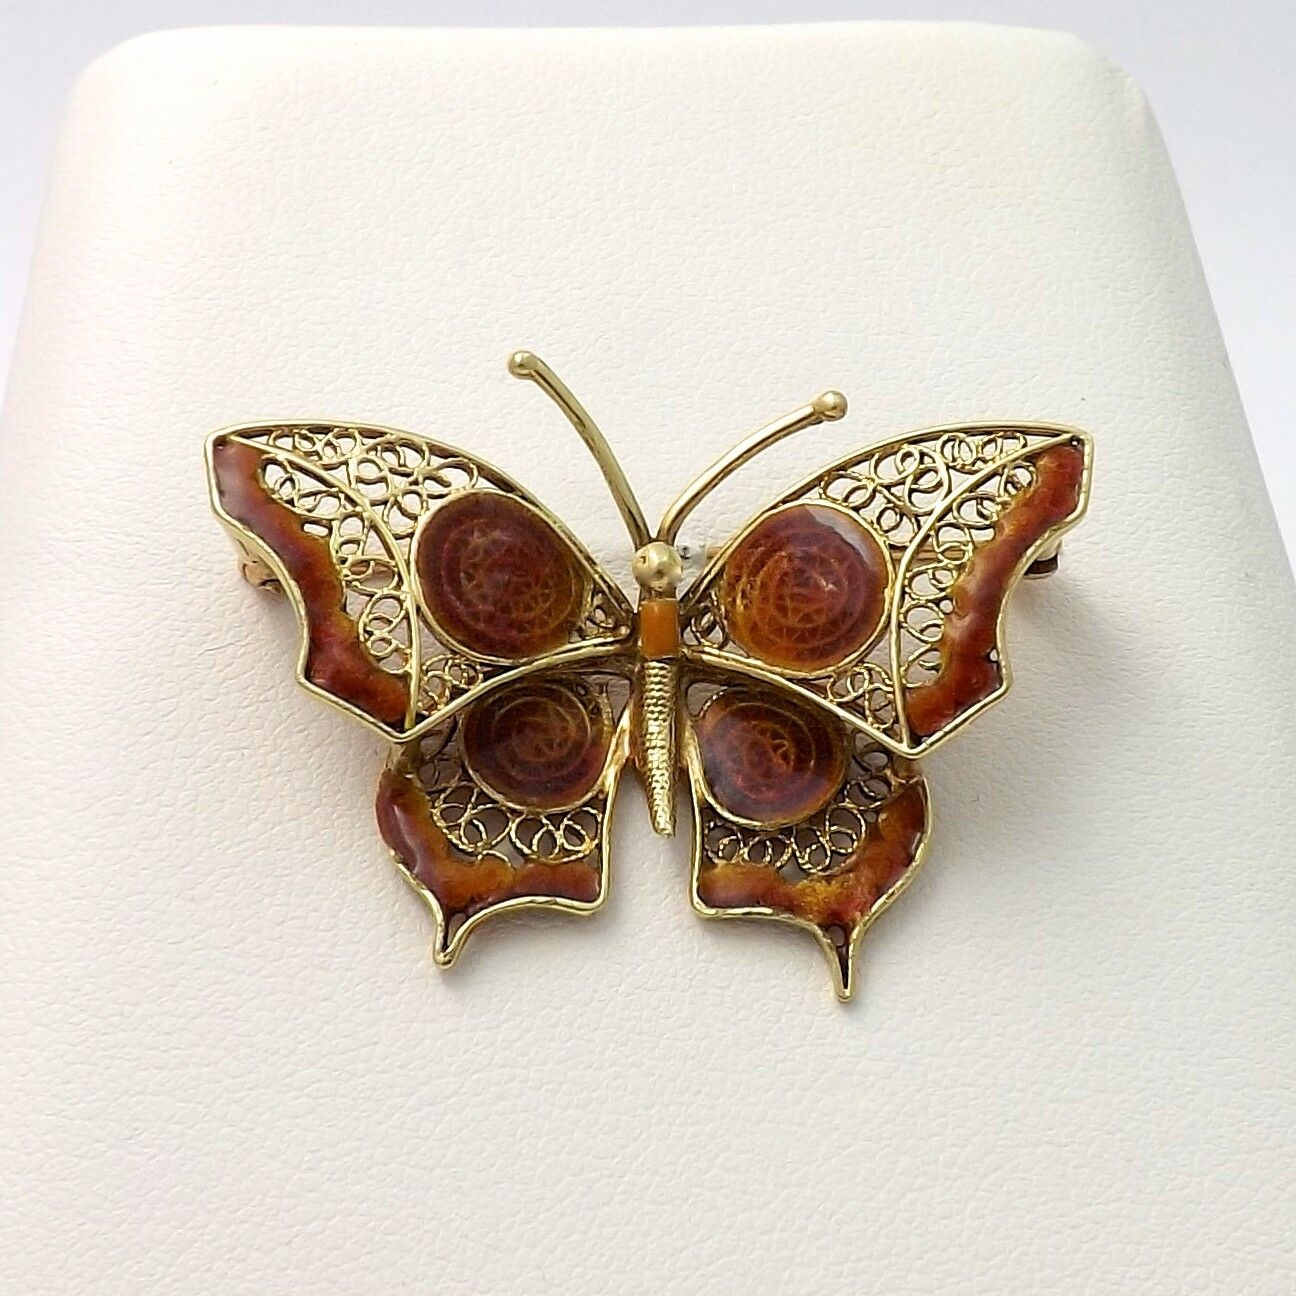 Vintage 14k gold Filigree Enamel Butterfly Brooch Pin 7.1gr